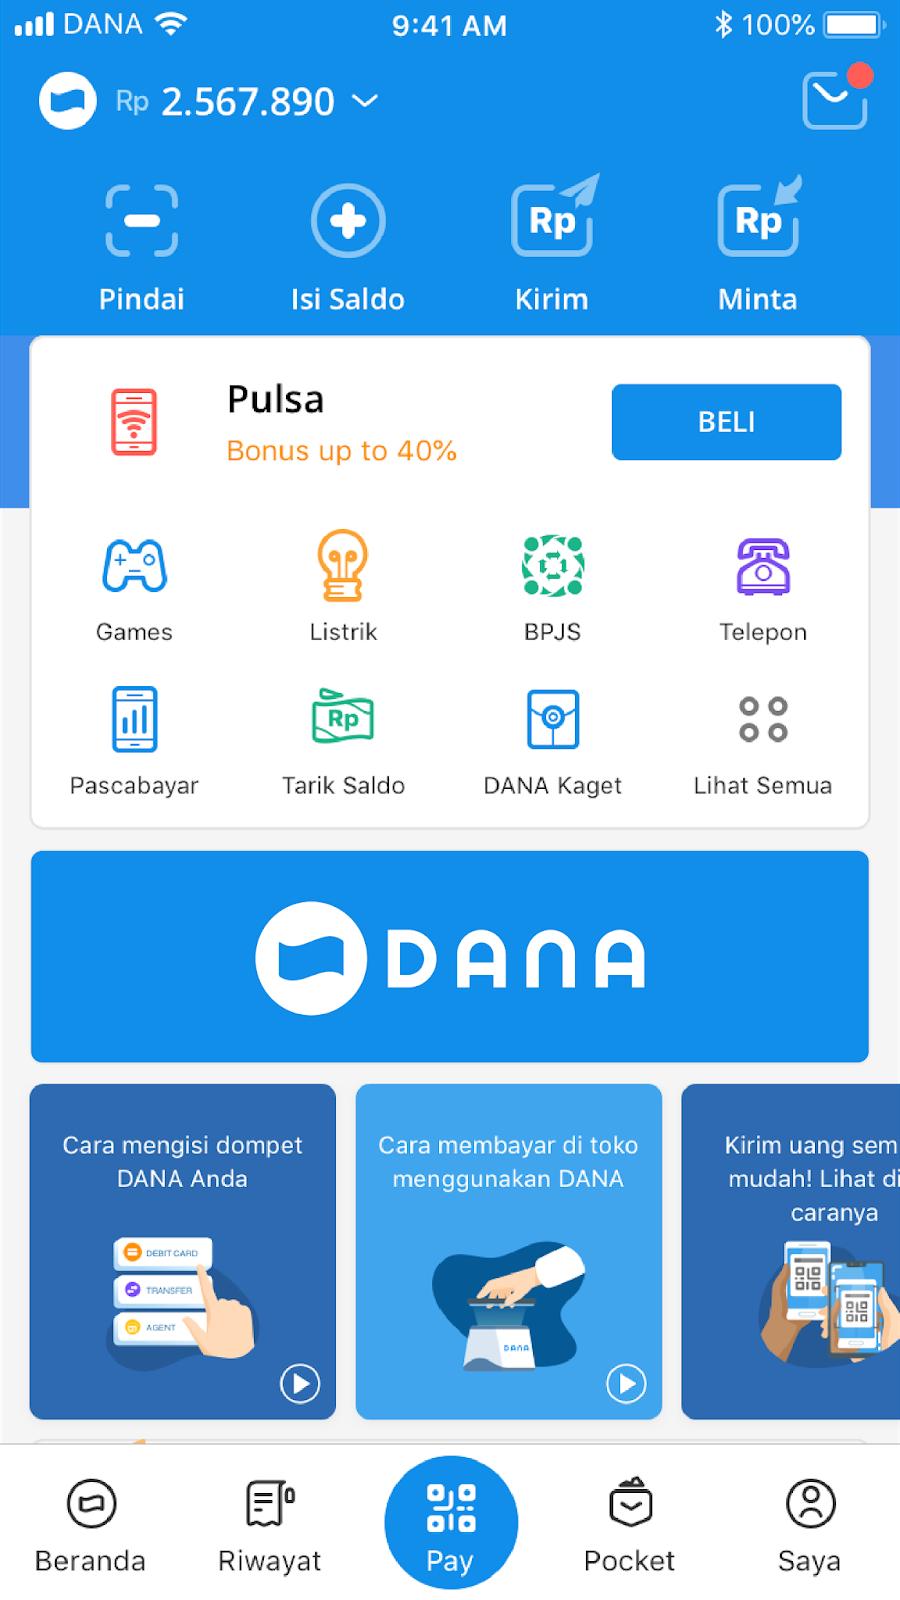 E Tech Profil Perusahaan Dana